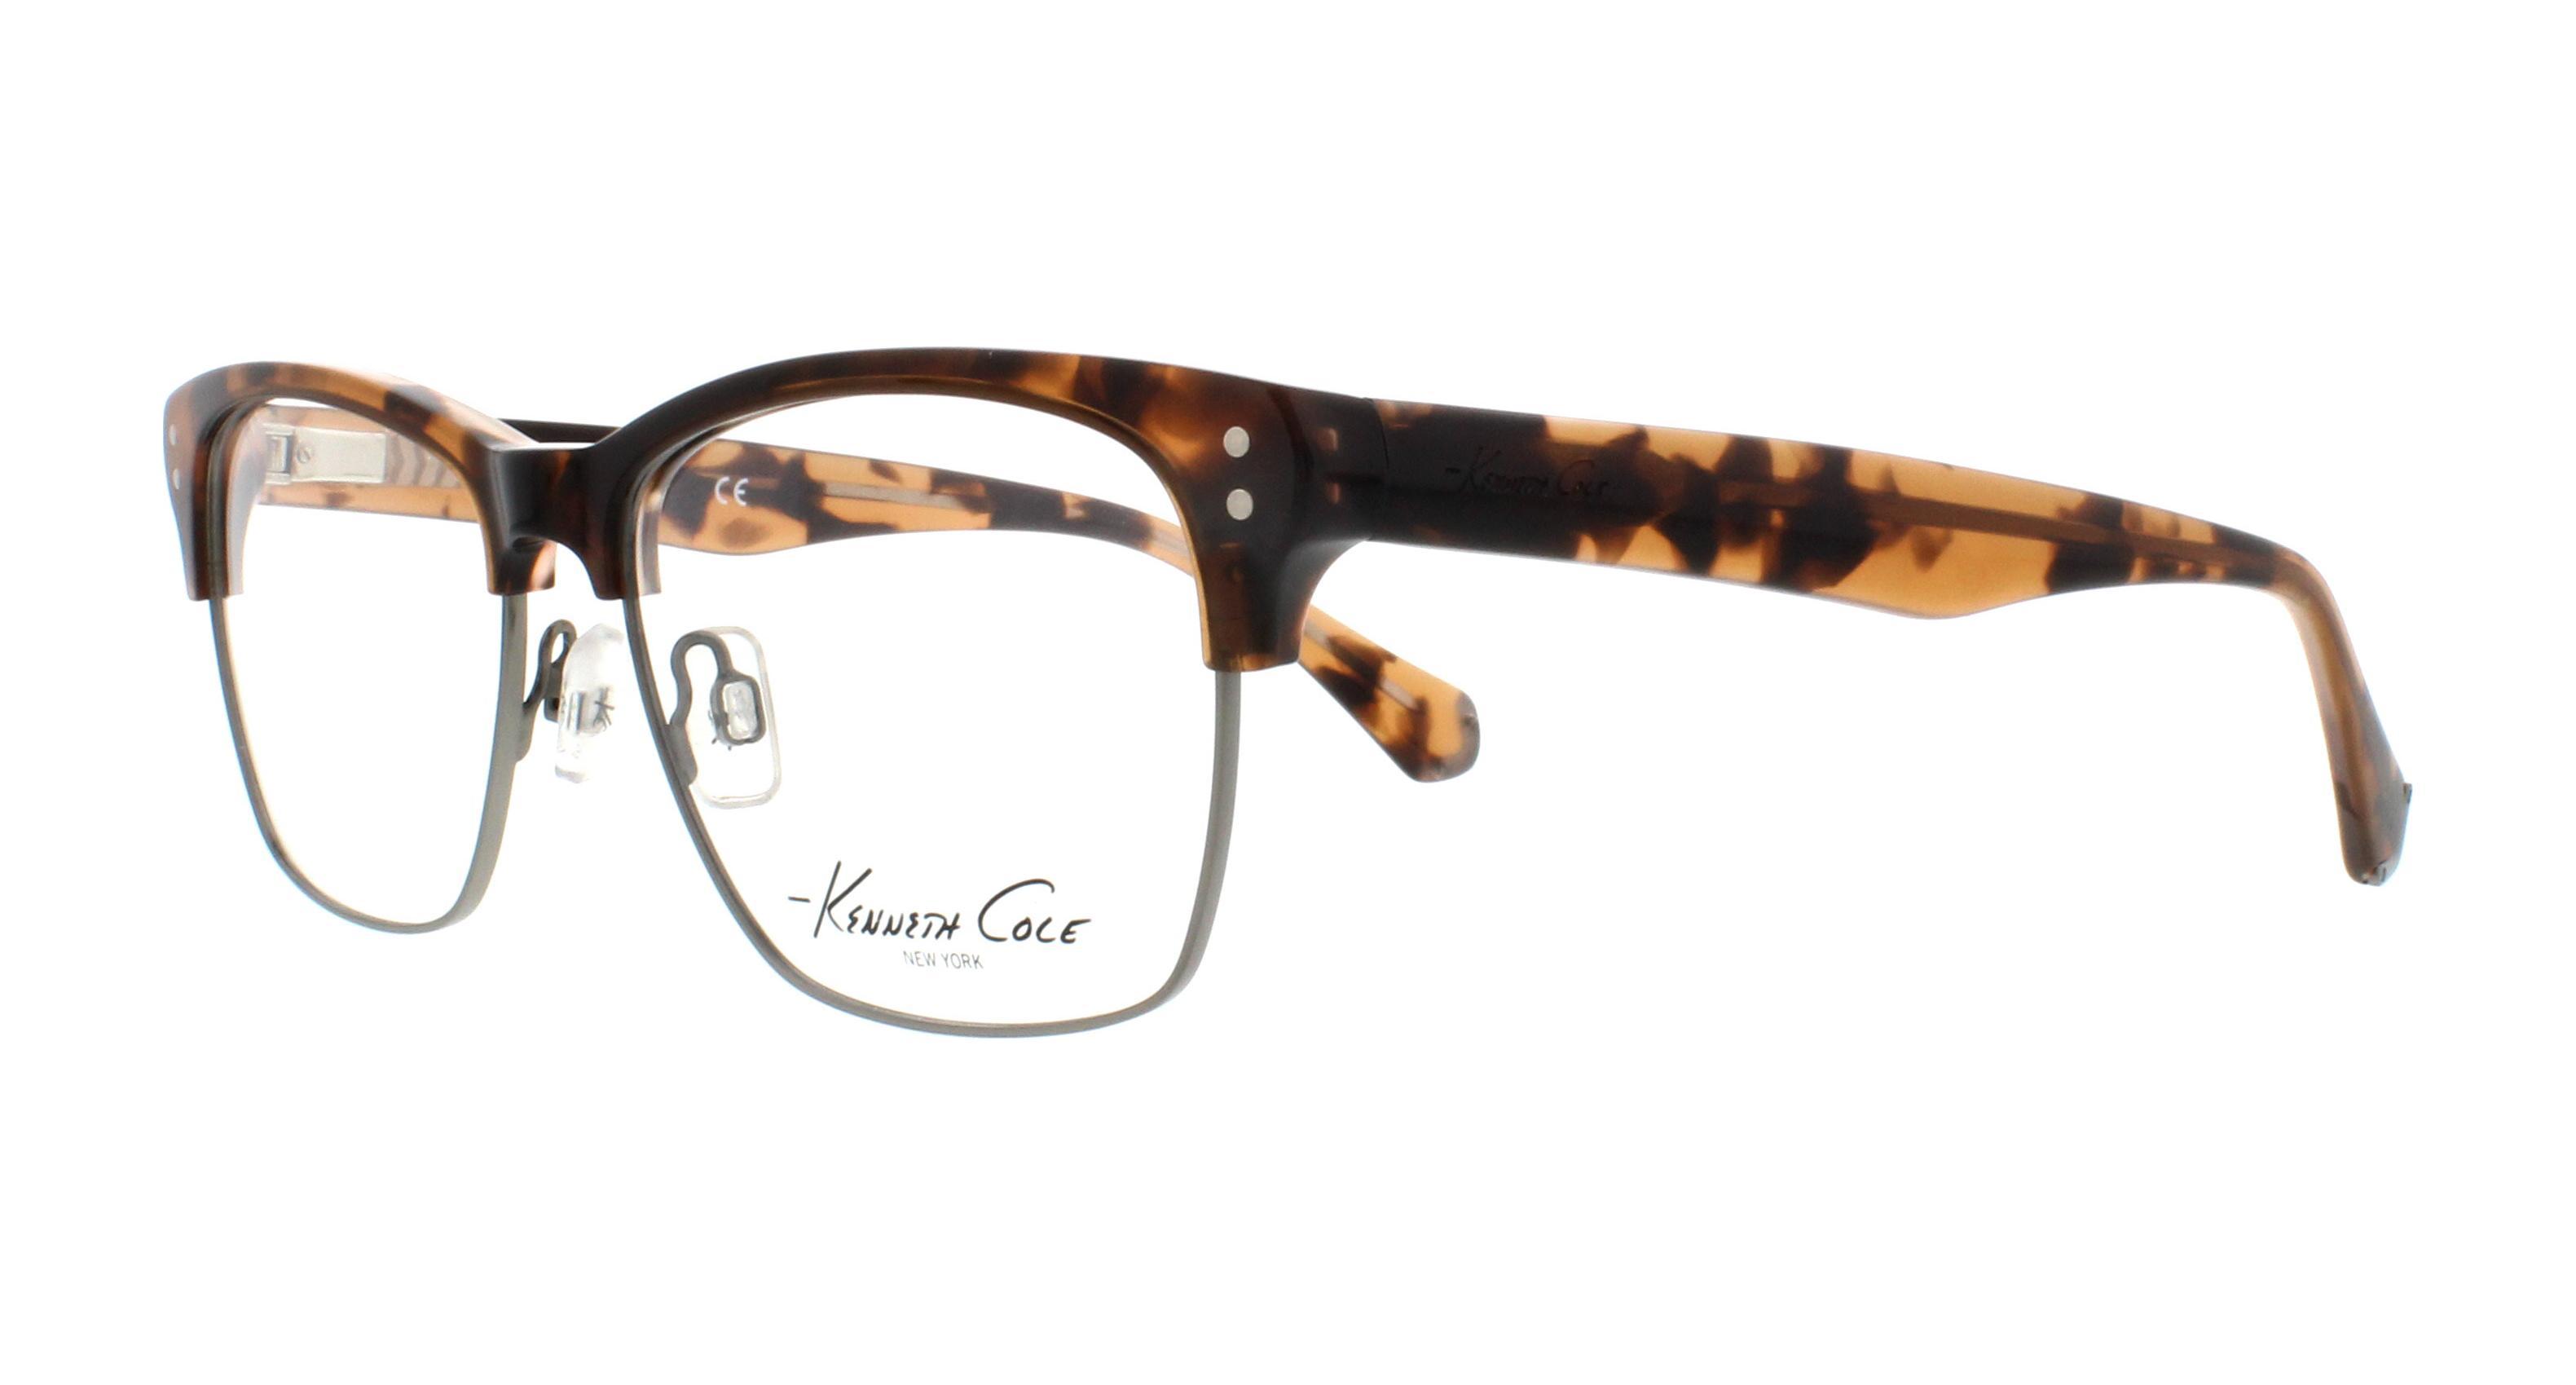 cf45275883 Details about KENNETH COLE REACTION Eyeglasses KC0221 050 Dark Brown 52MM